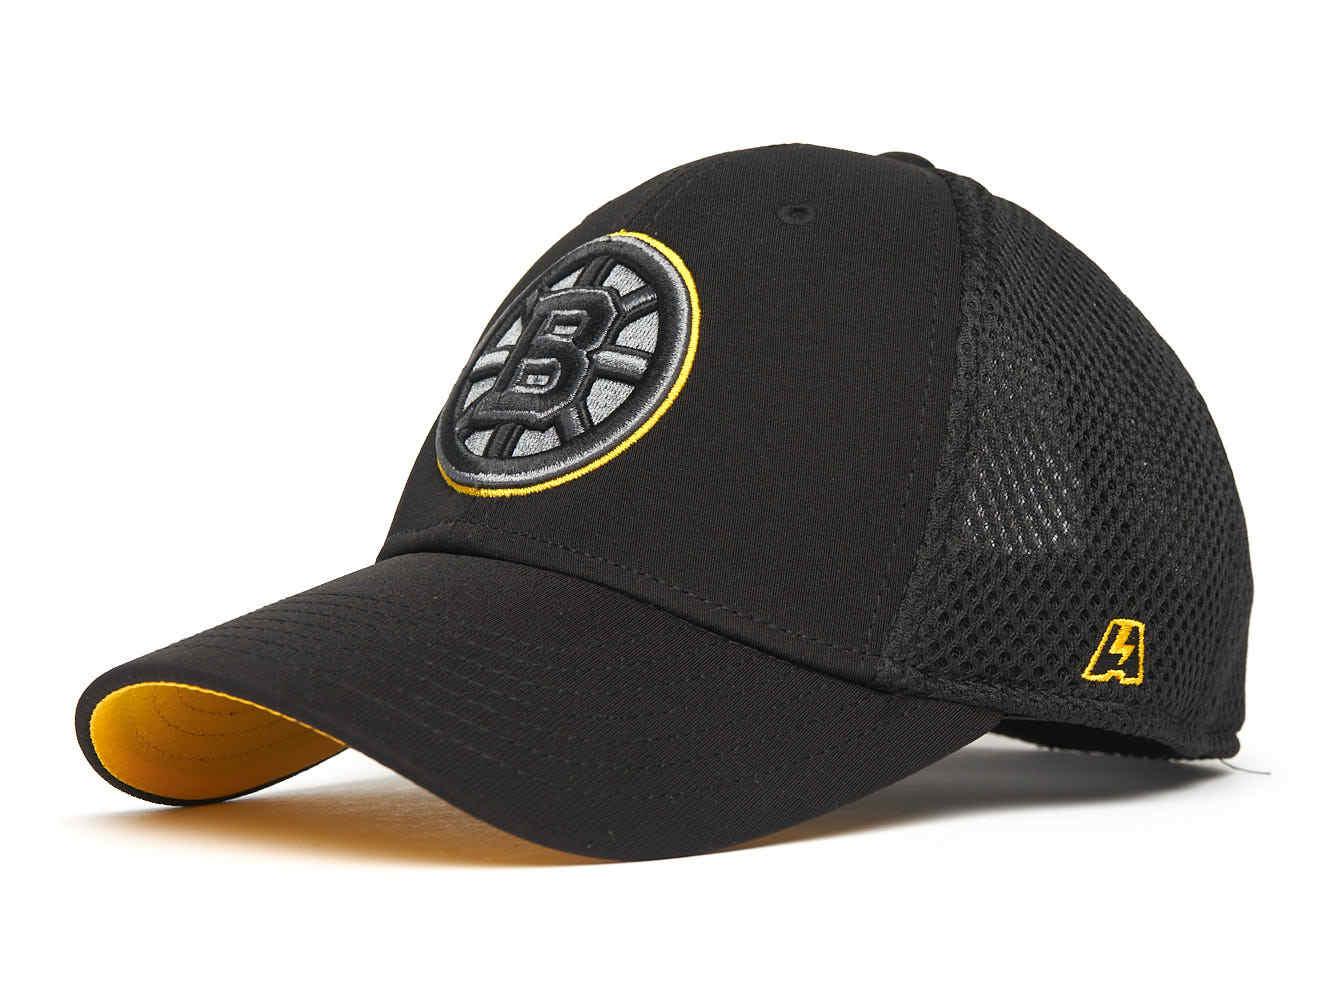 Бейсболка NHL Boston Bruins (размер M/L)